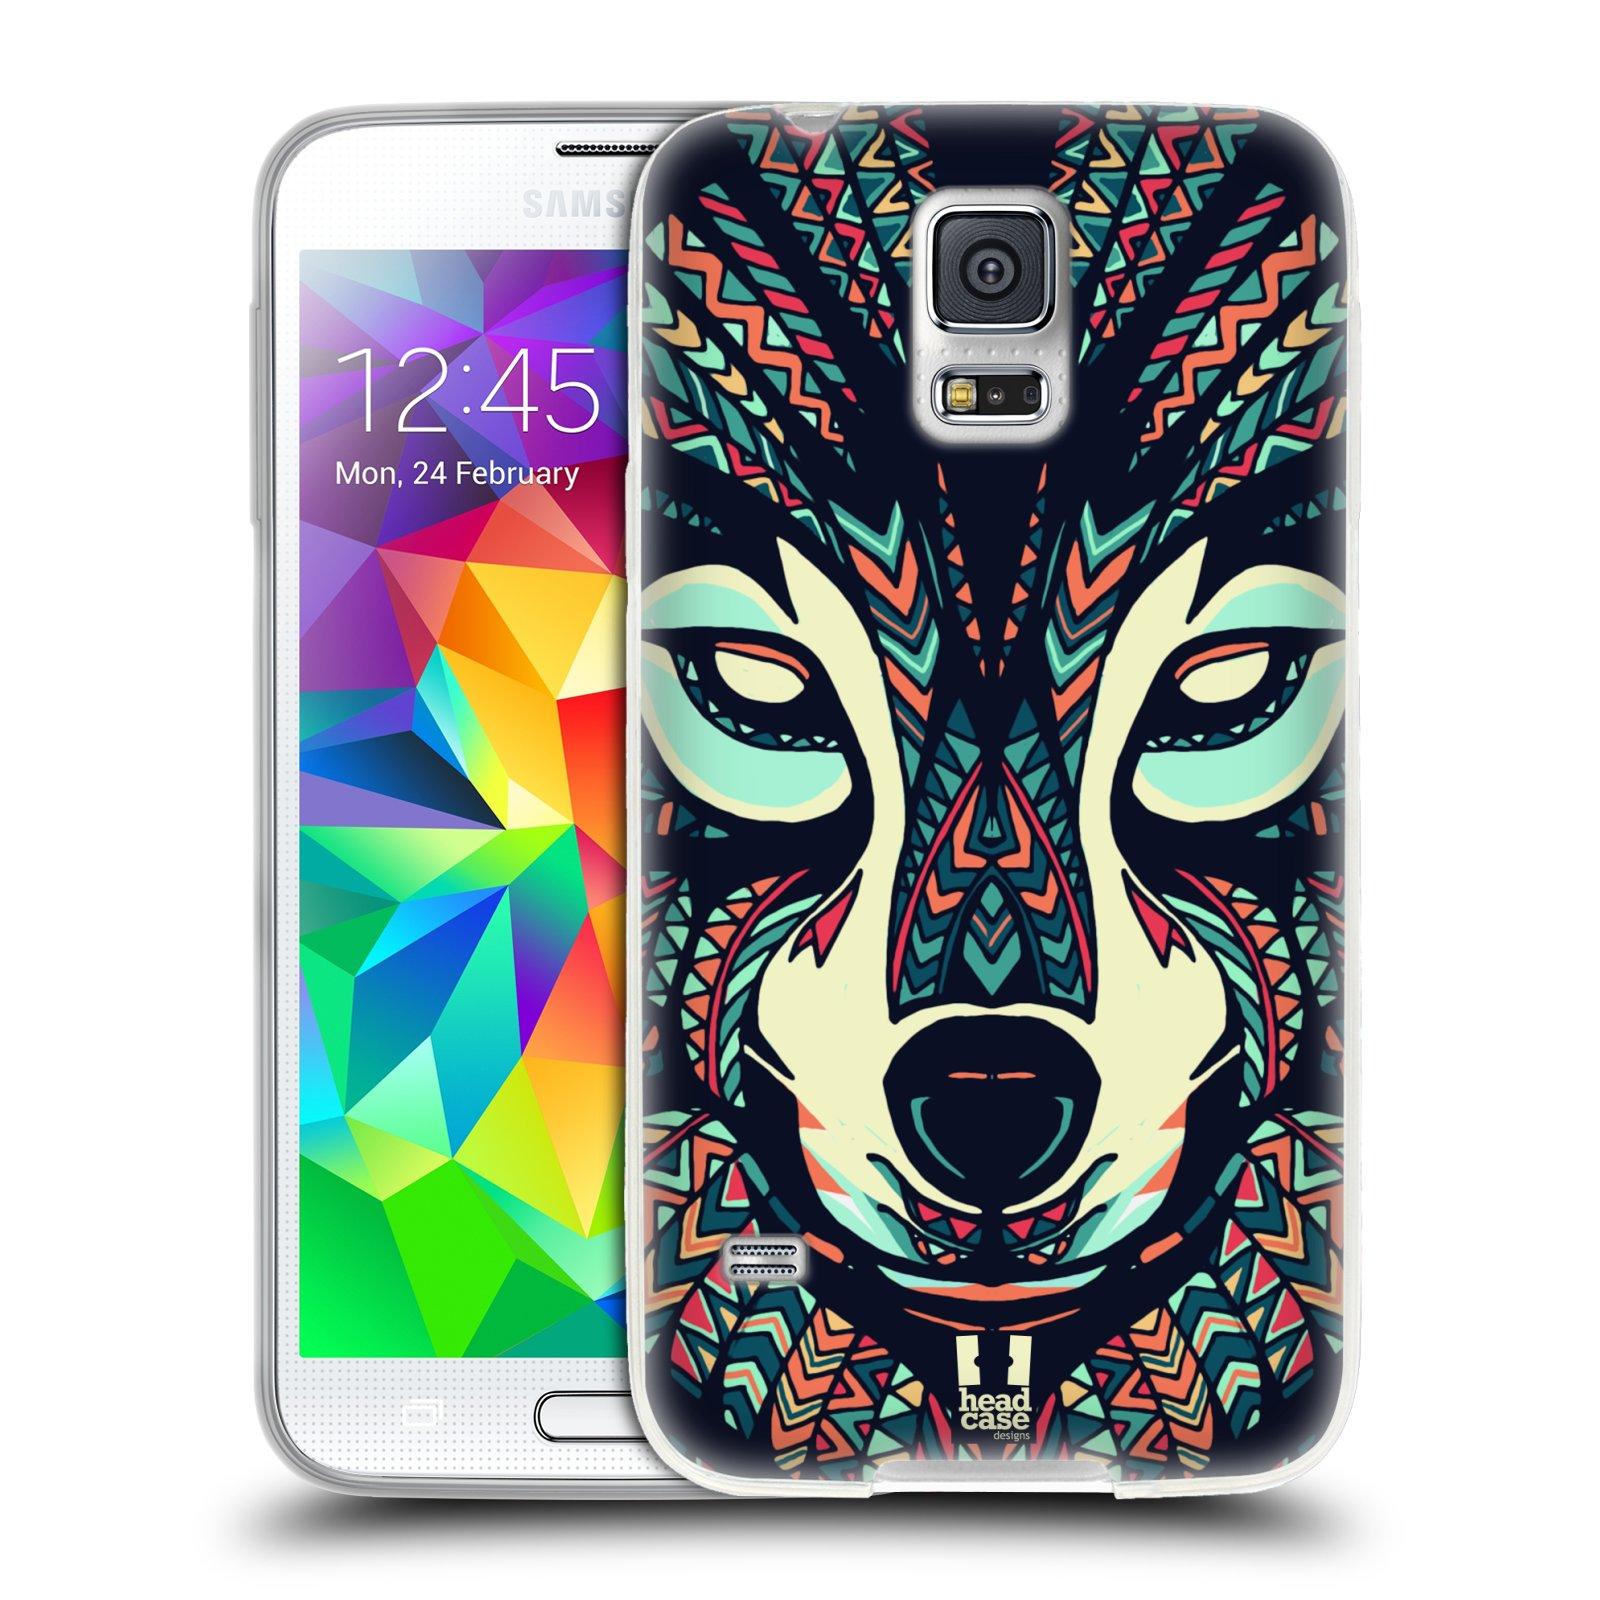 Silikonové pouzdro na mobil Samsung Galaxy S5 HEAD CASE AZTEC VLK